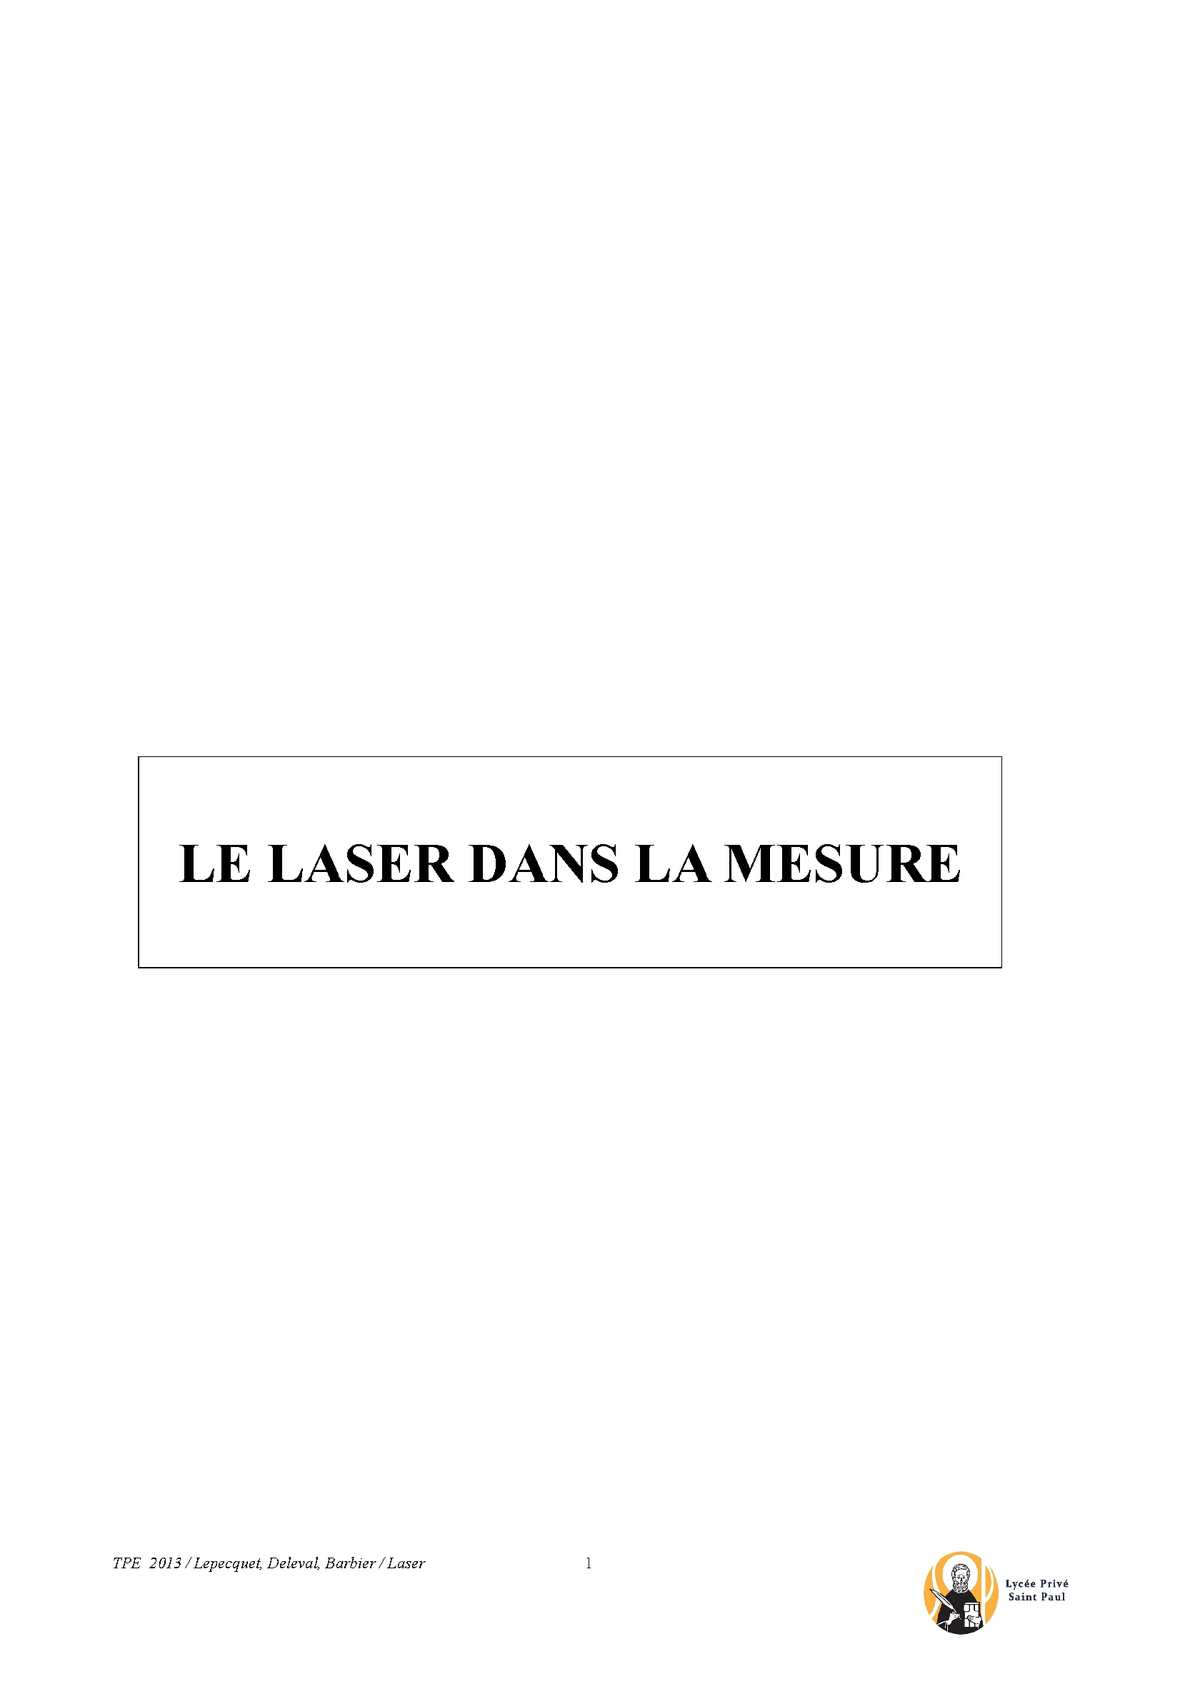 Calaméo Tpe Laser Dans La Mesure